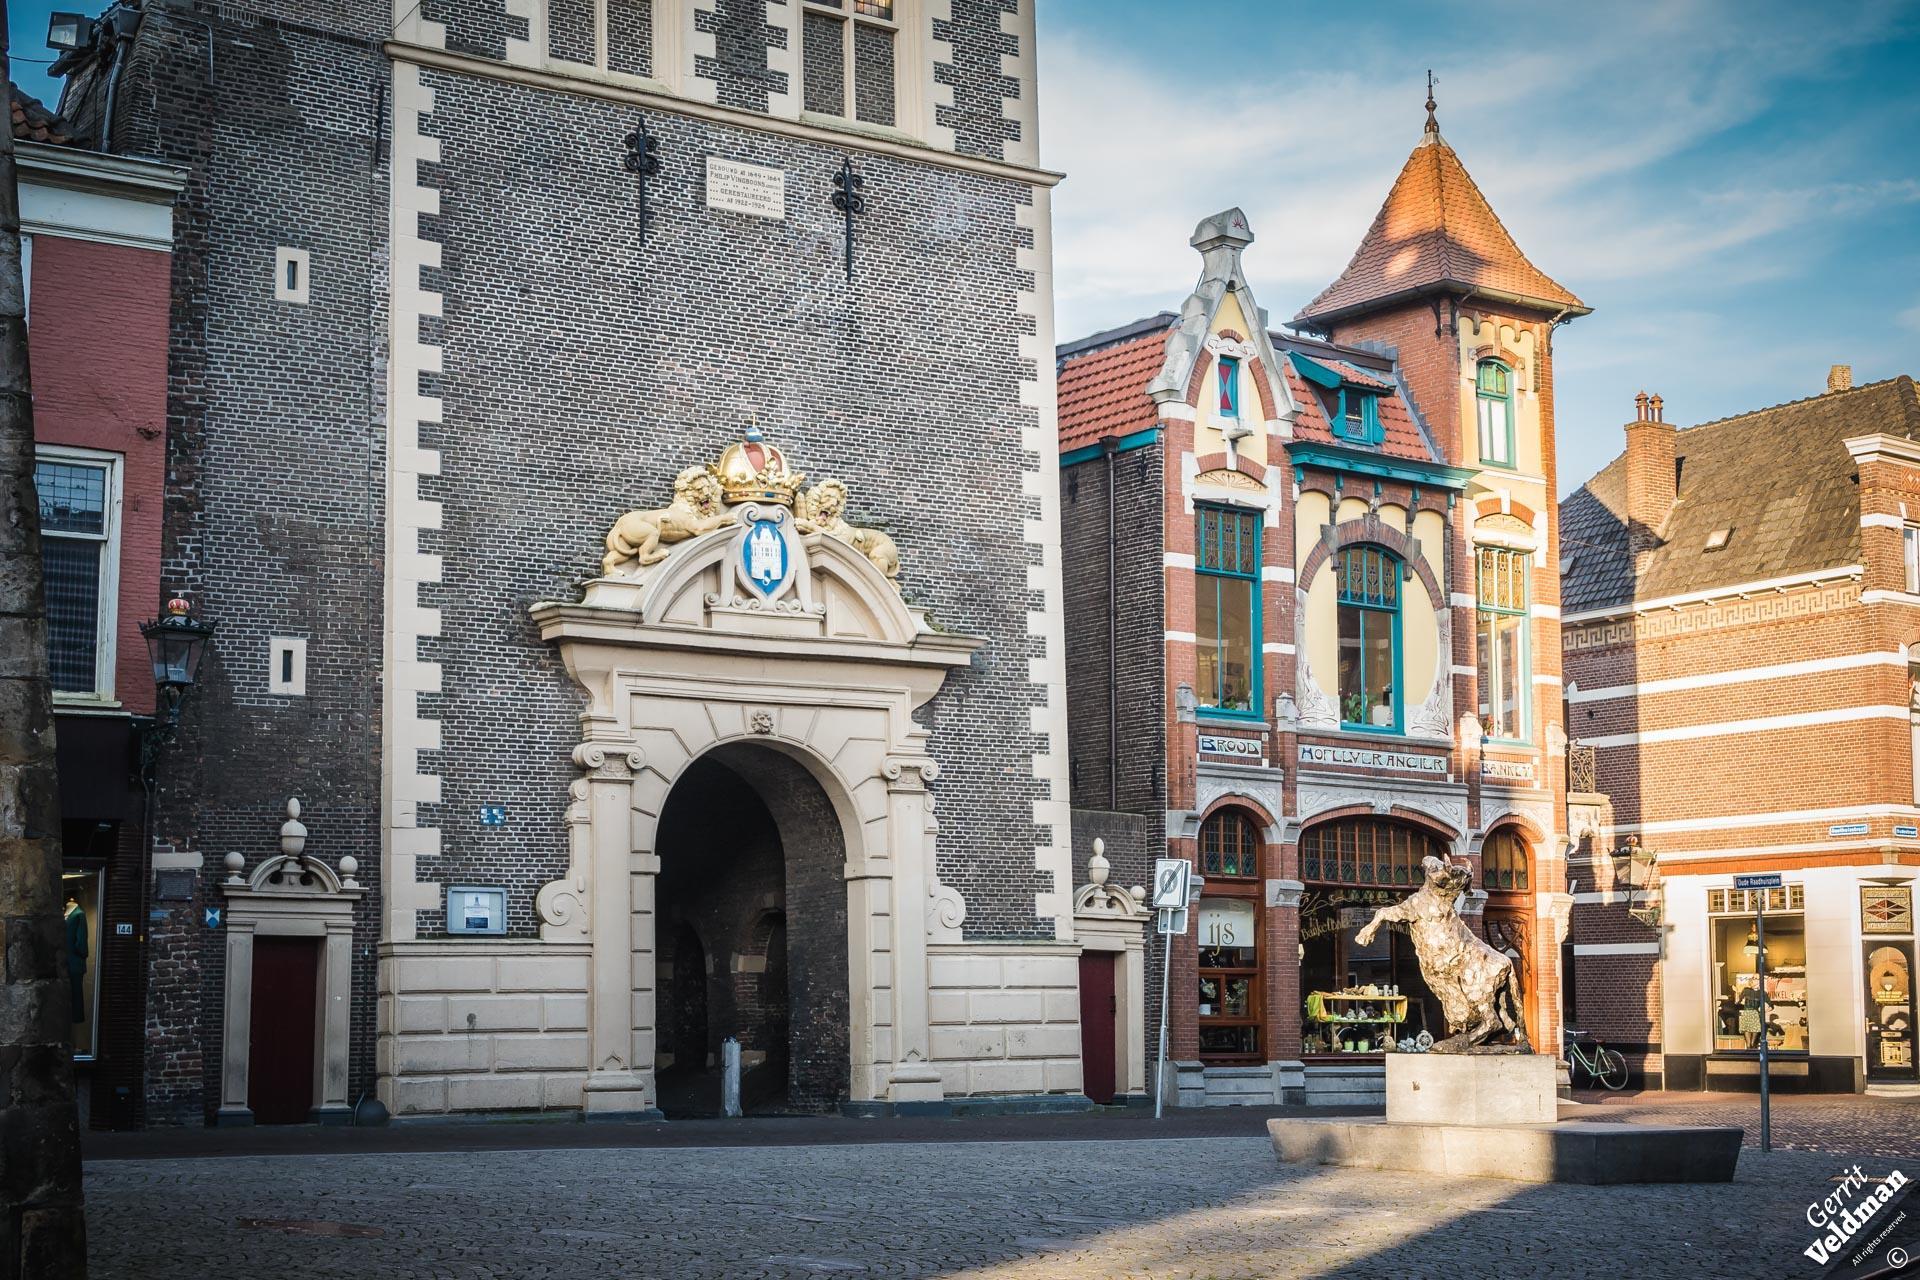 Oude Raadhuisplein, Kampen